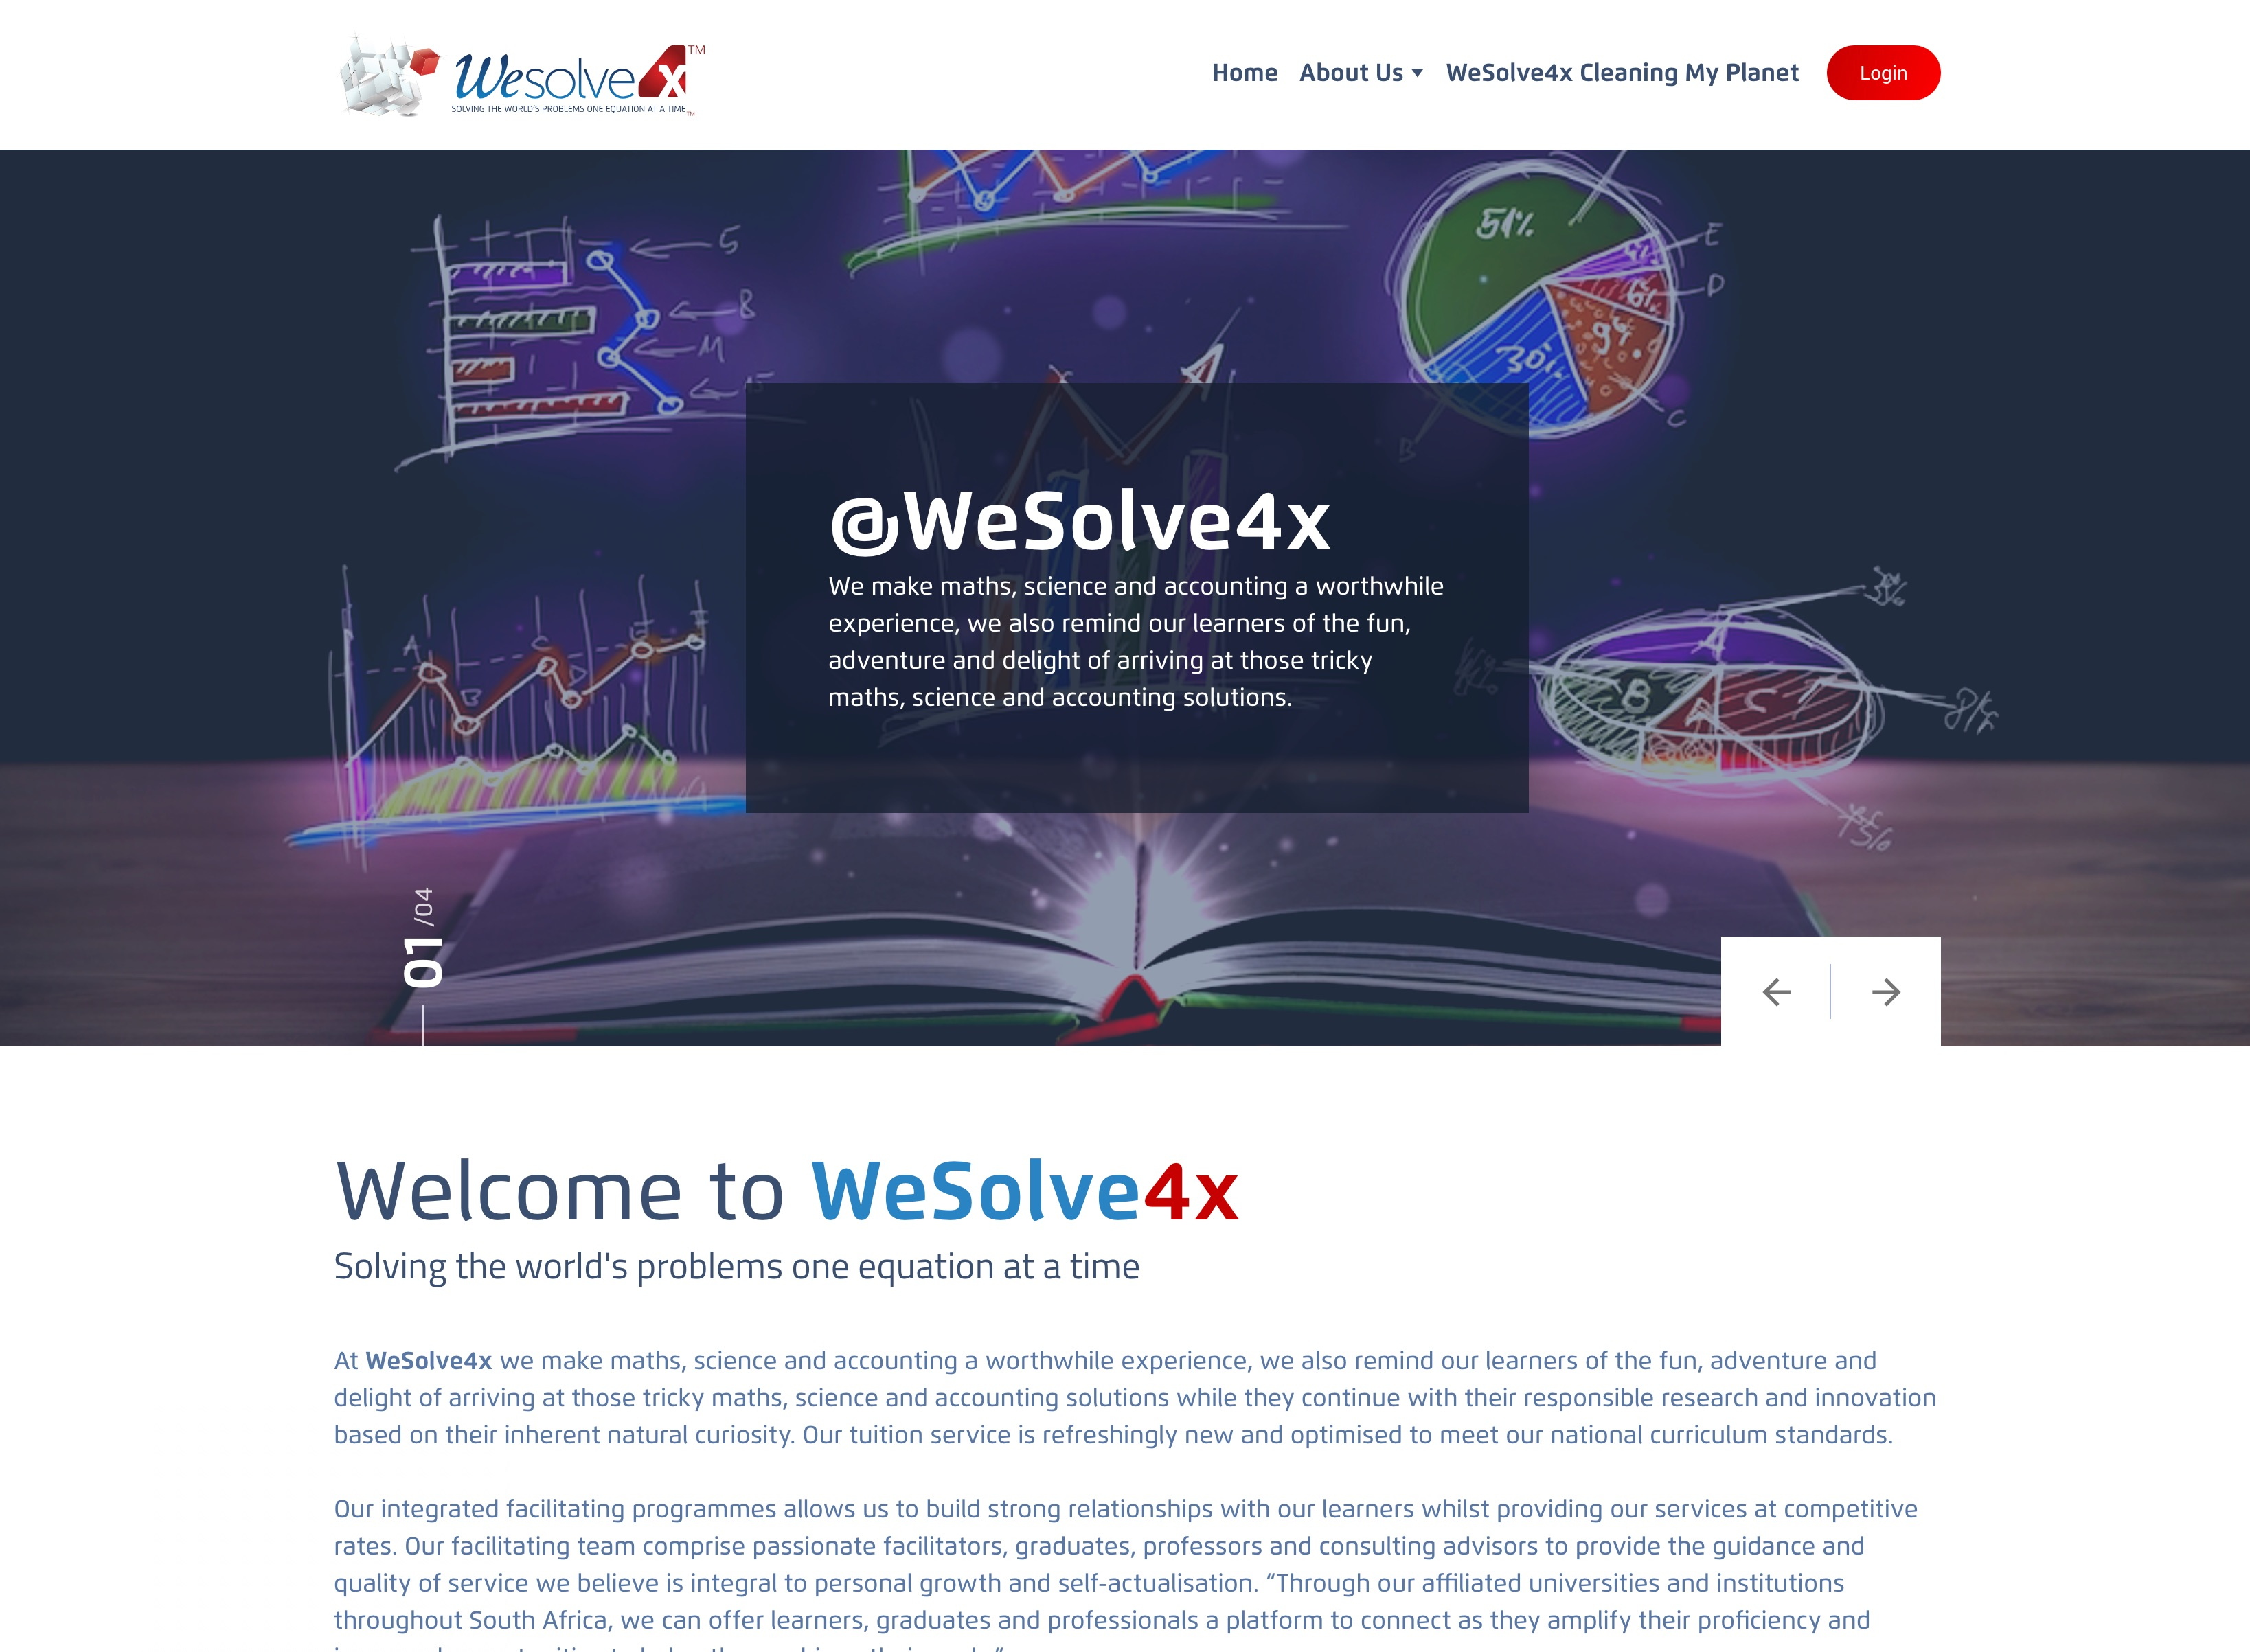 WeSolve4x Website Screenshot